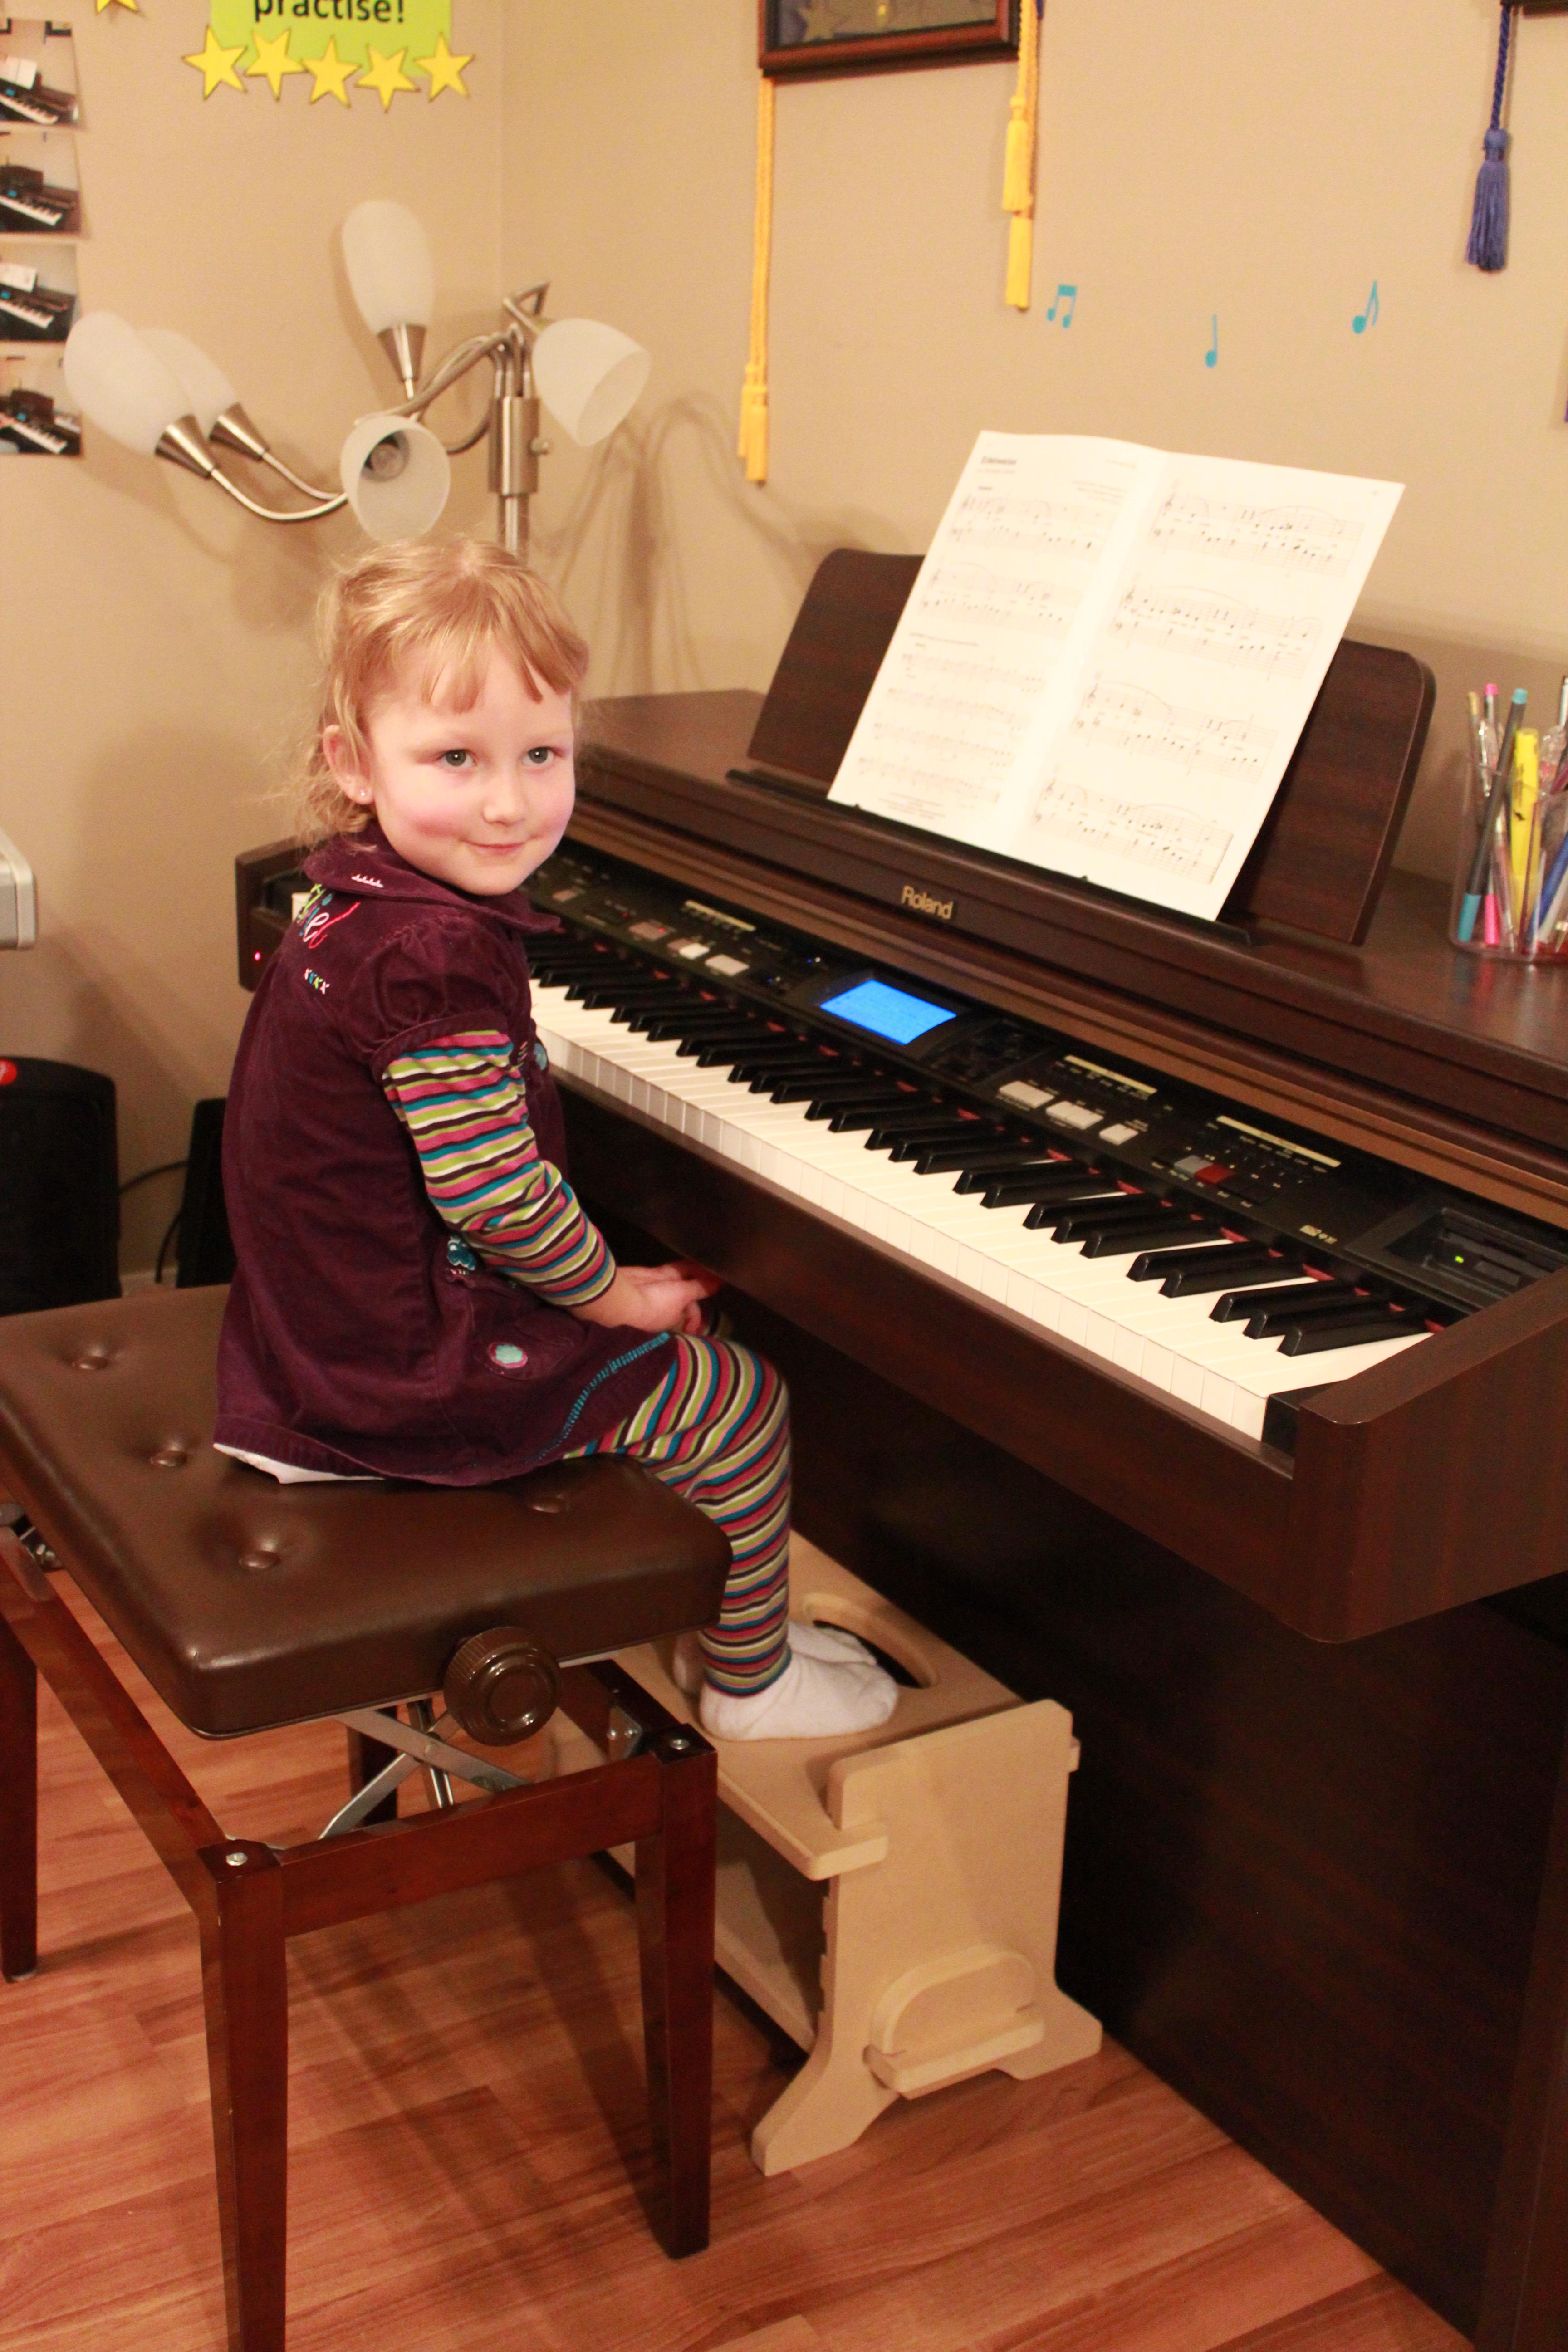 Piano Stool Adjustable Height Andexinger Klavierbank Lift